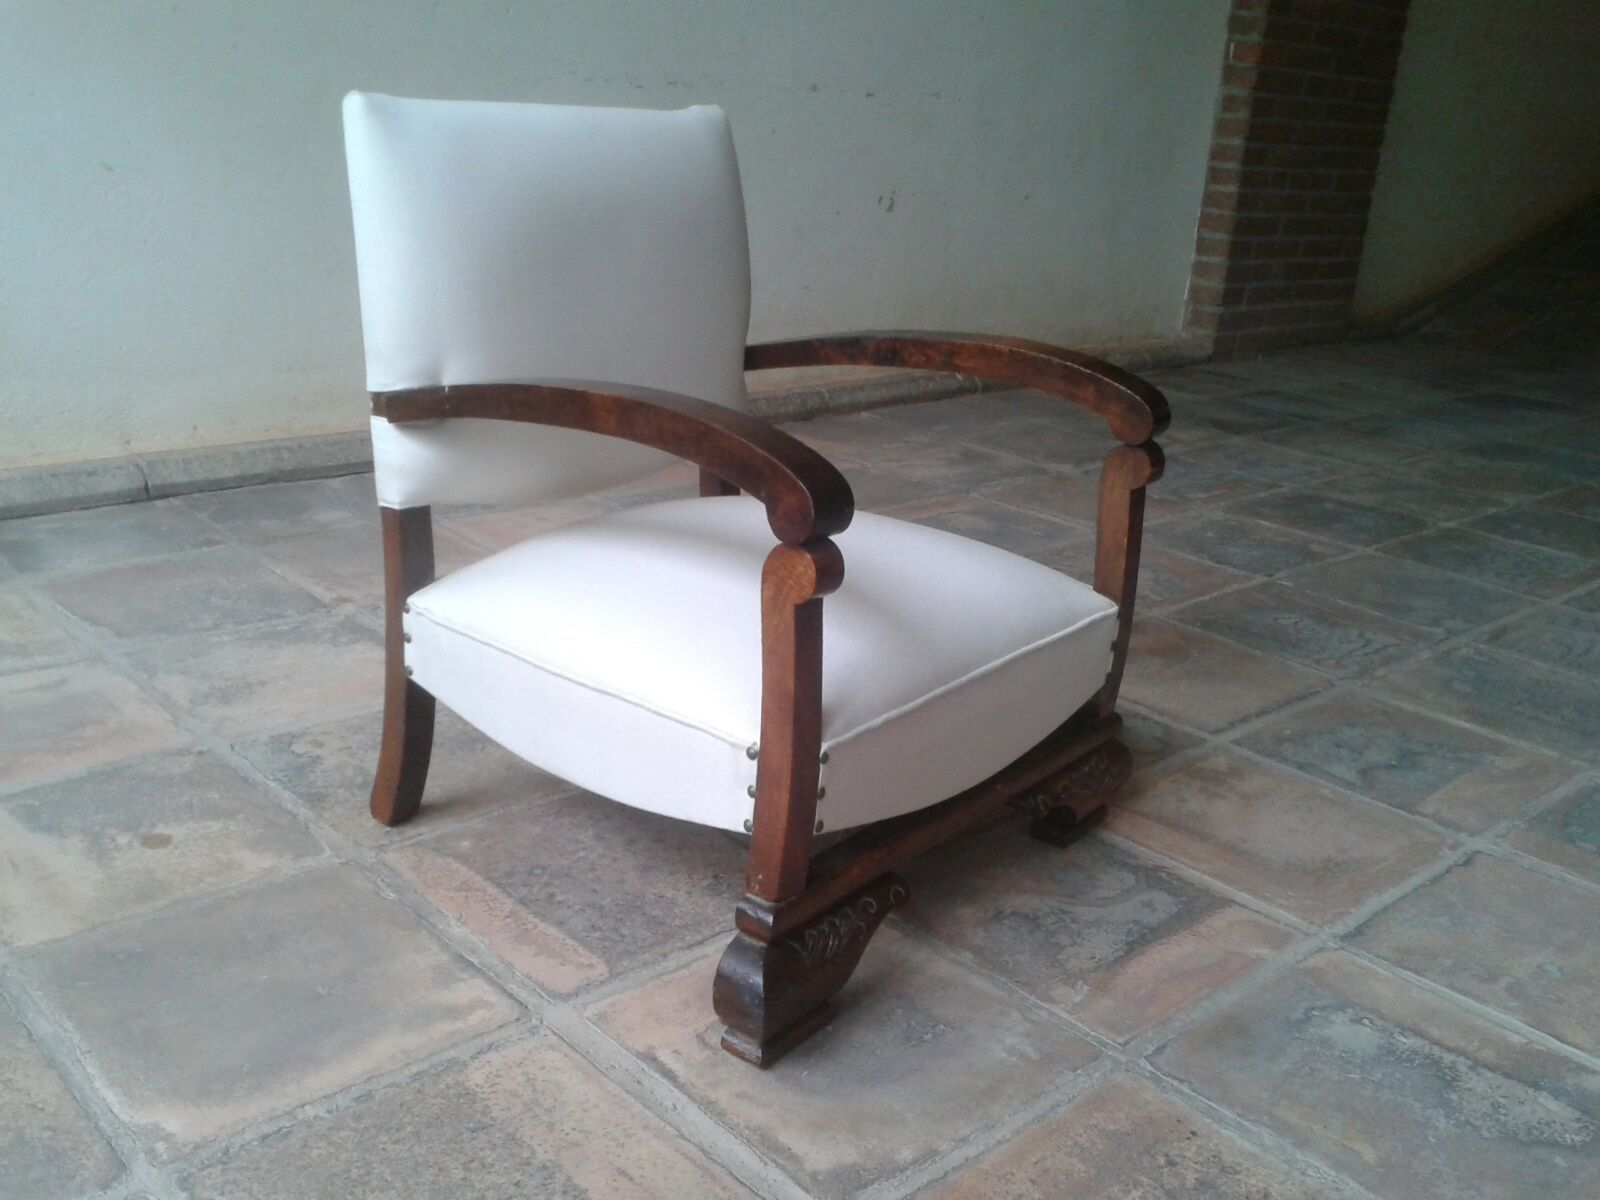 Descalzadora Baja Recuperaci N De Muebles Pinterest  # Muebles Butacas